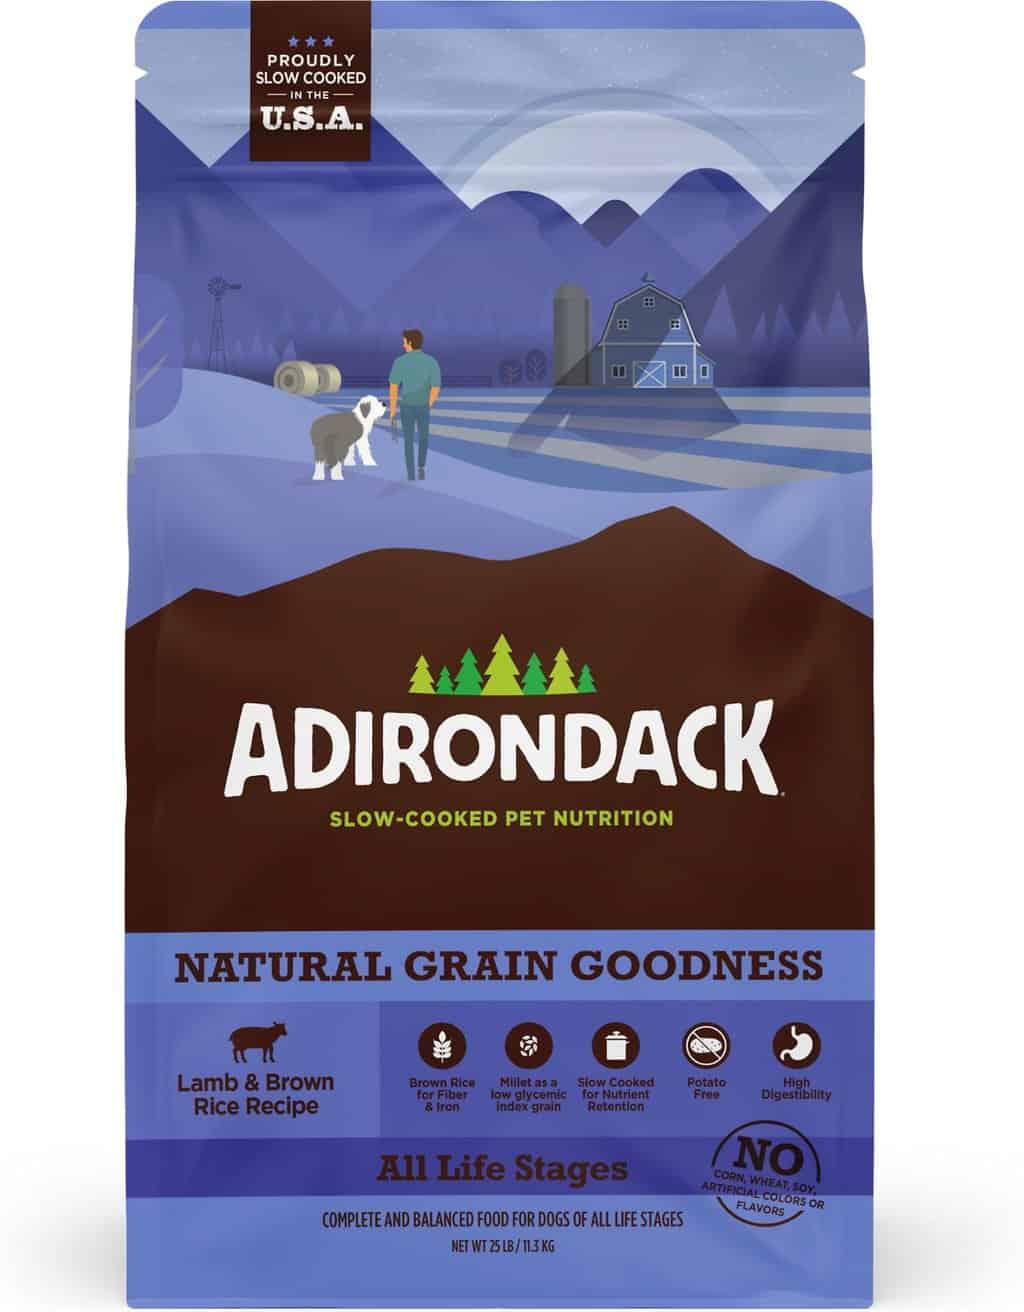 Adirondack Dog Food Review, Recalls & Coupons [year] 18